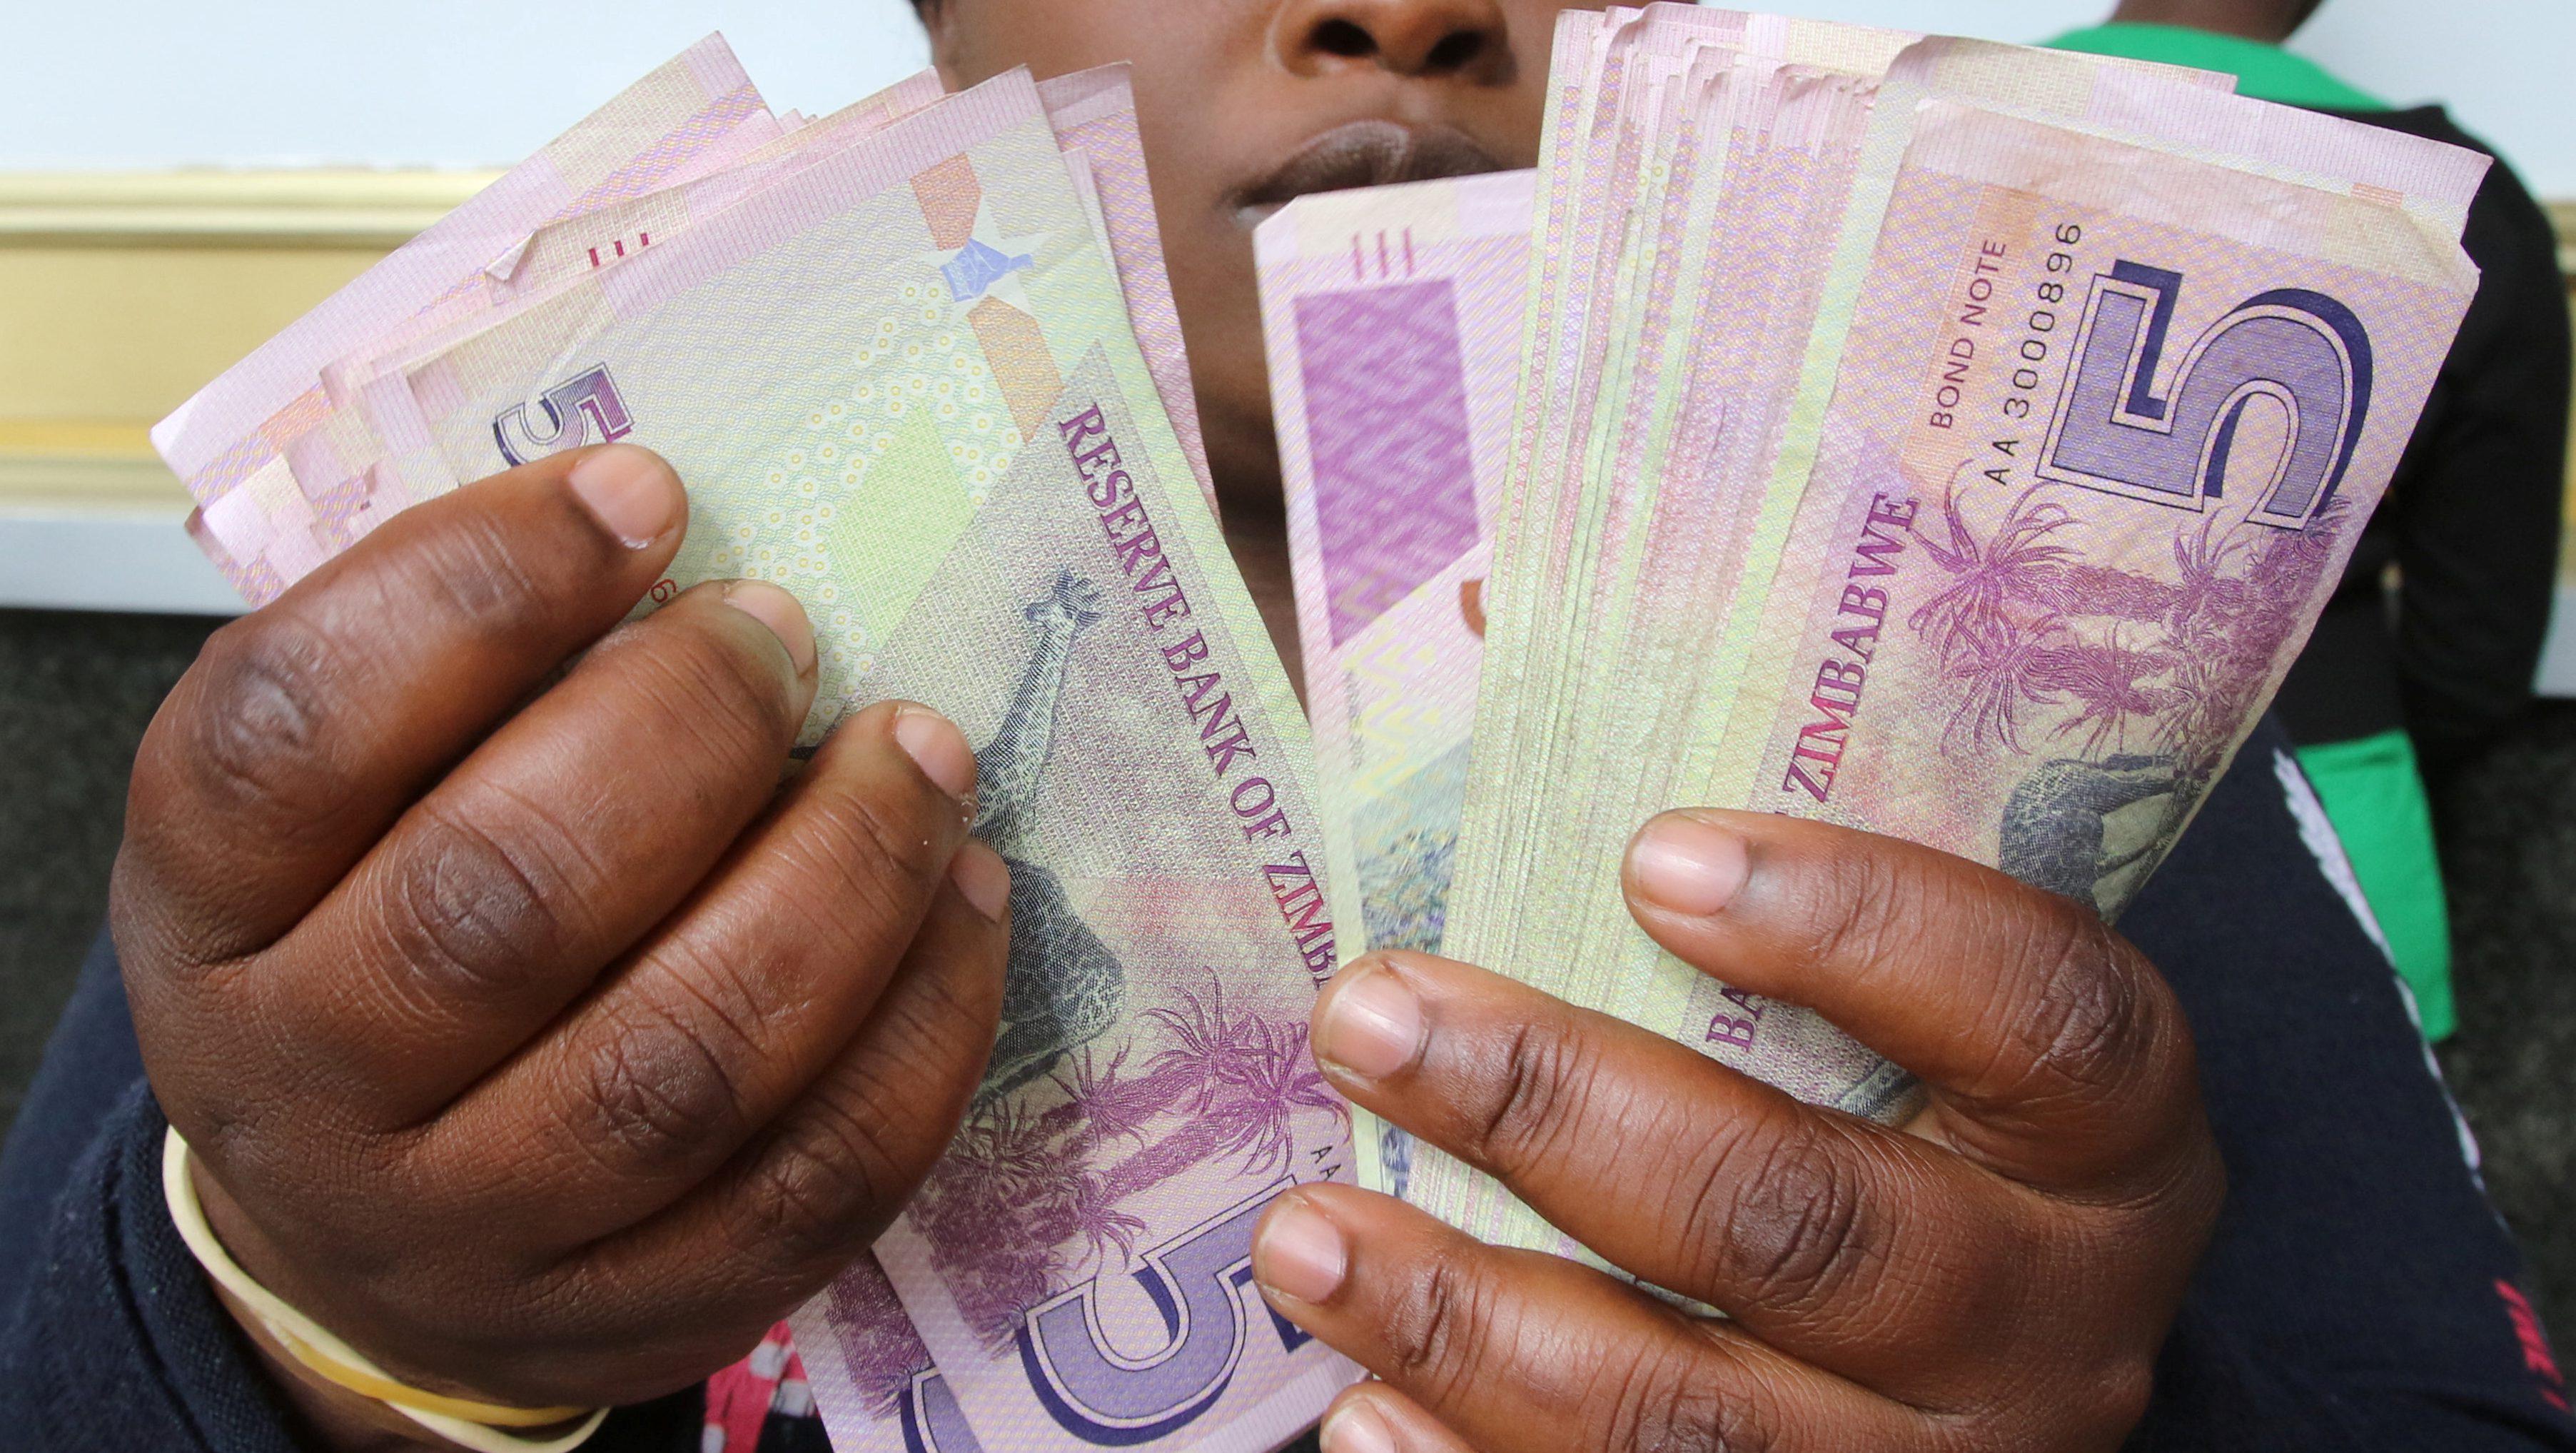 Us Dollar Bond Notes Have Lost Value